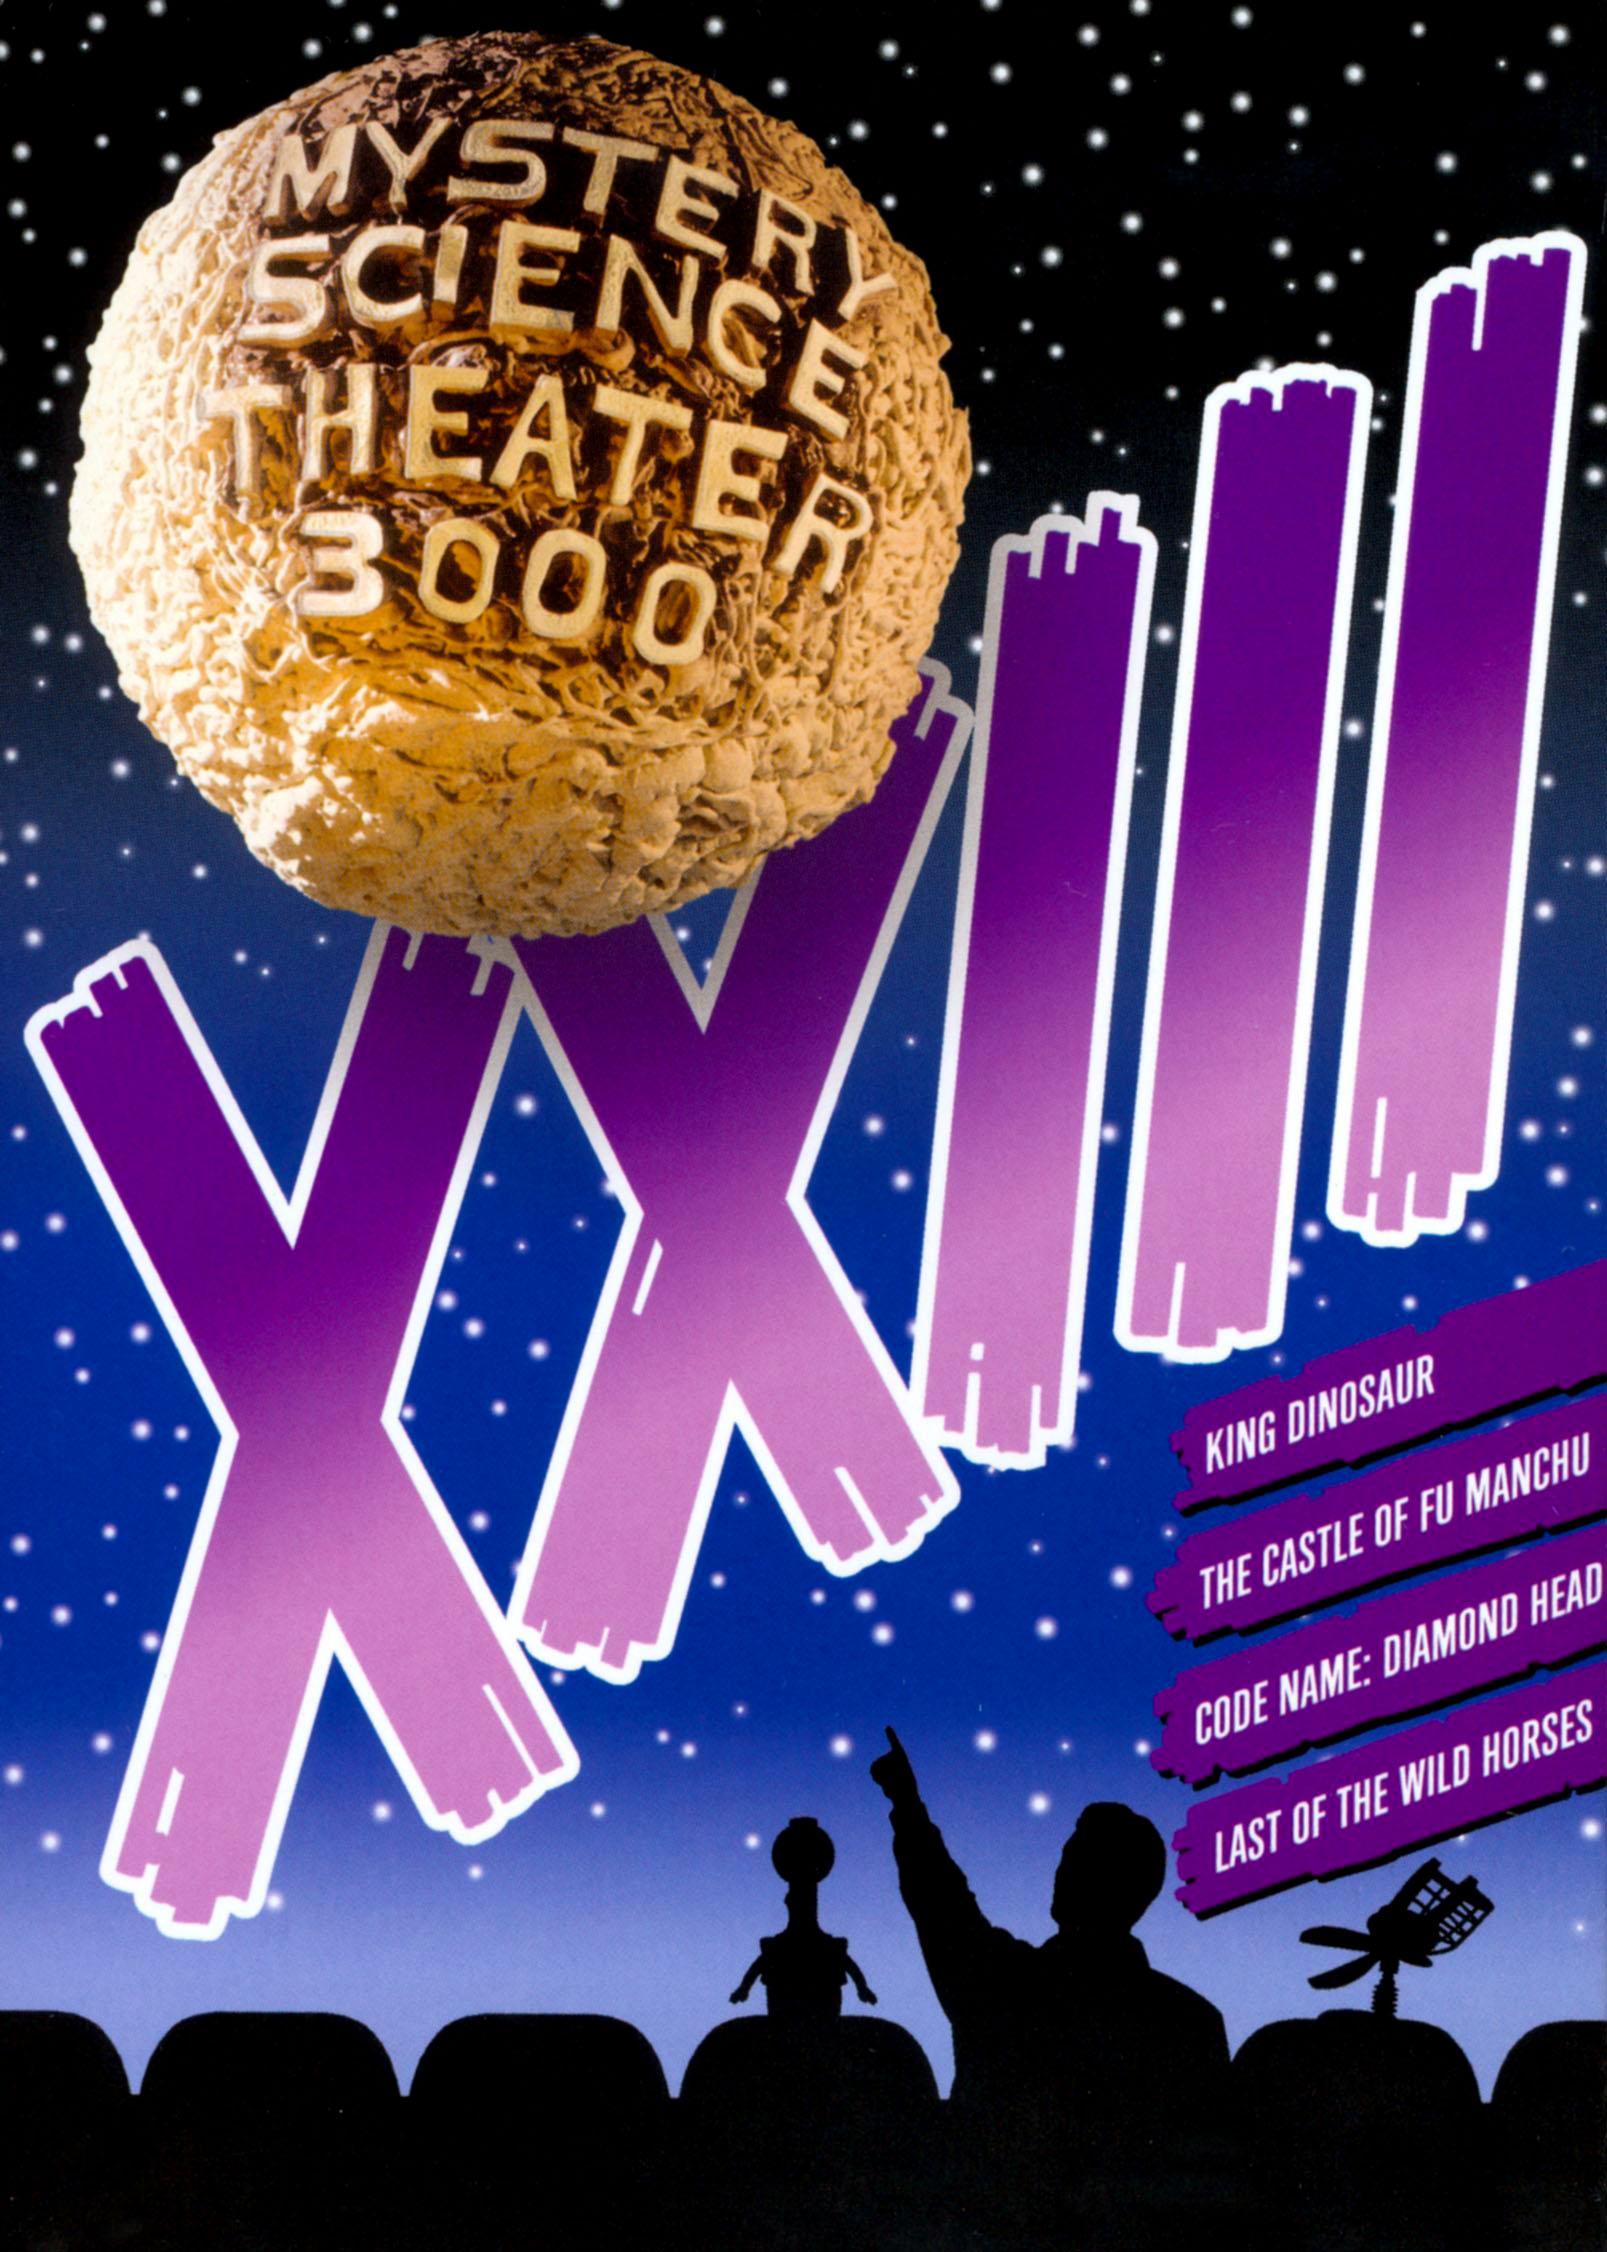 Mystery Science Theater 3000: Xxiii [4 Discs] (dvd) 4790408